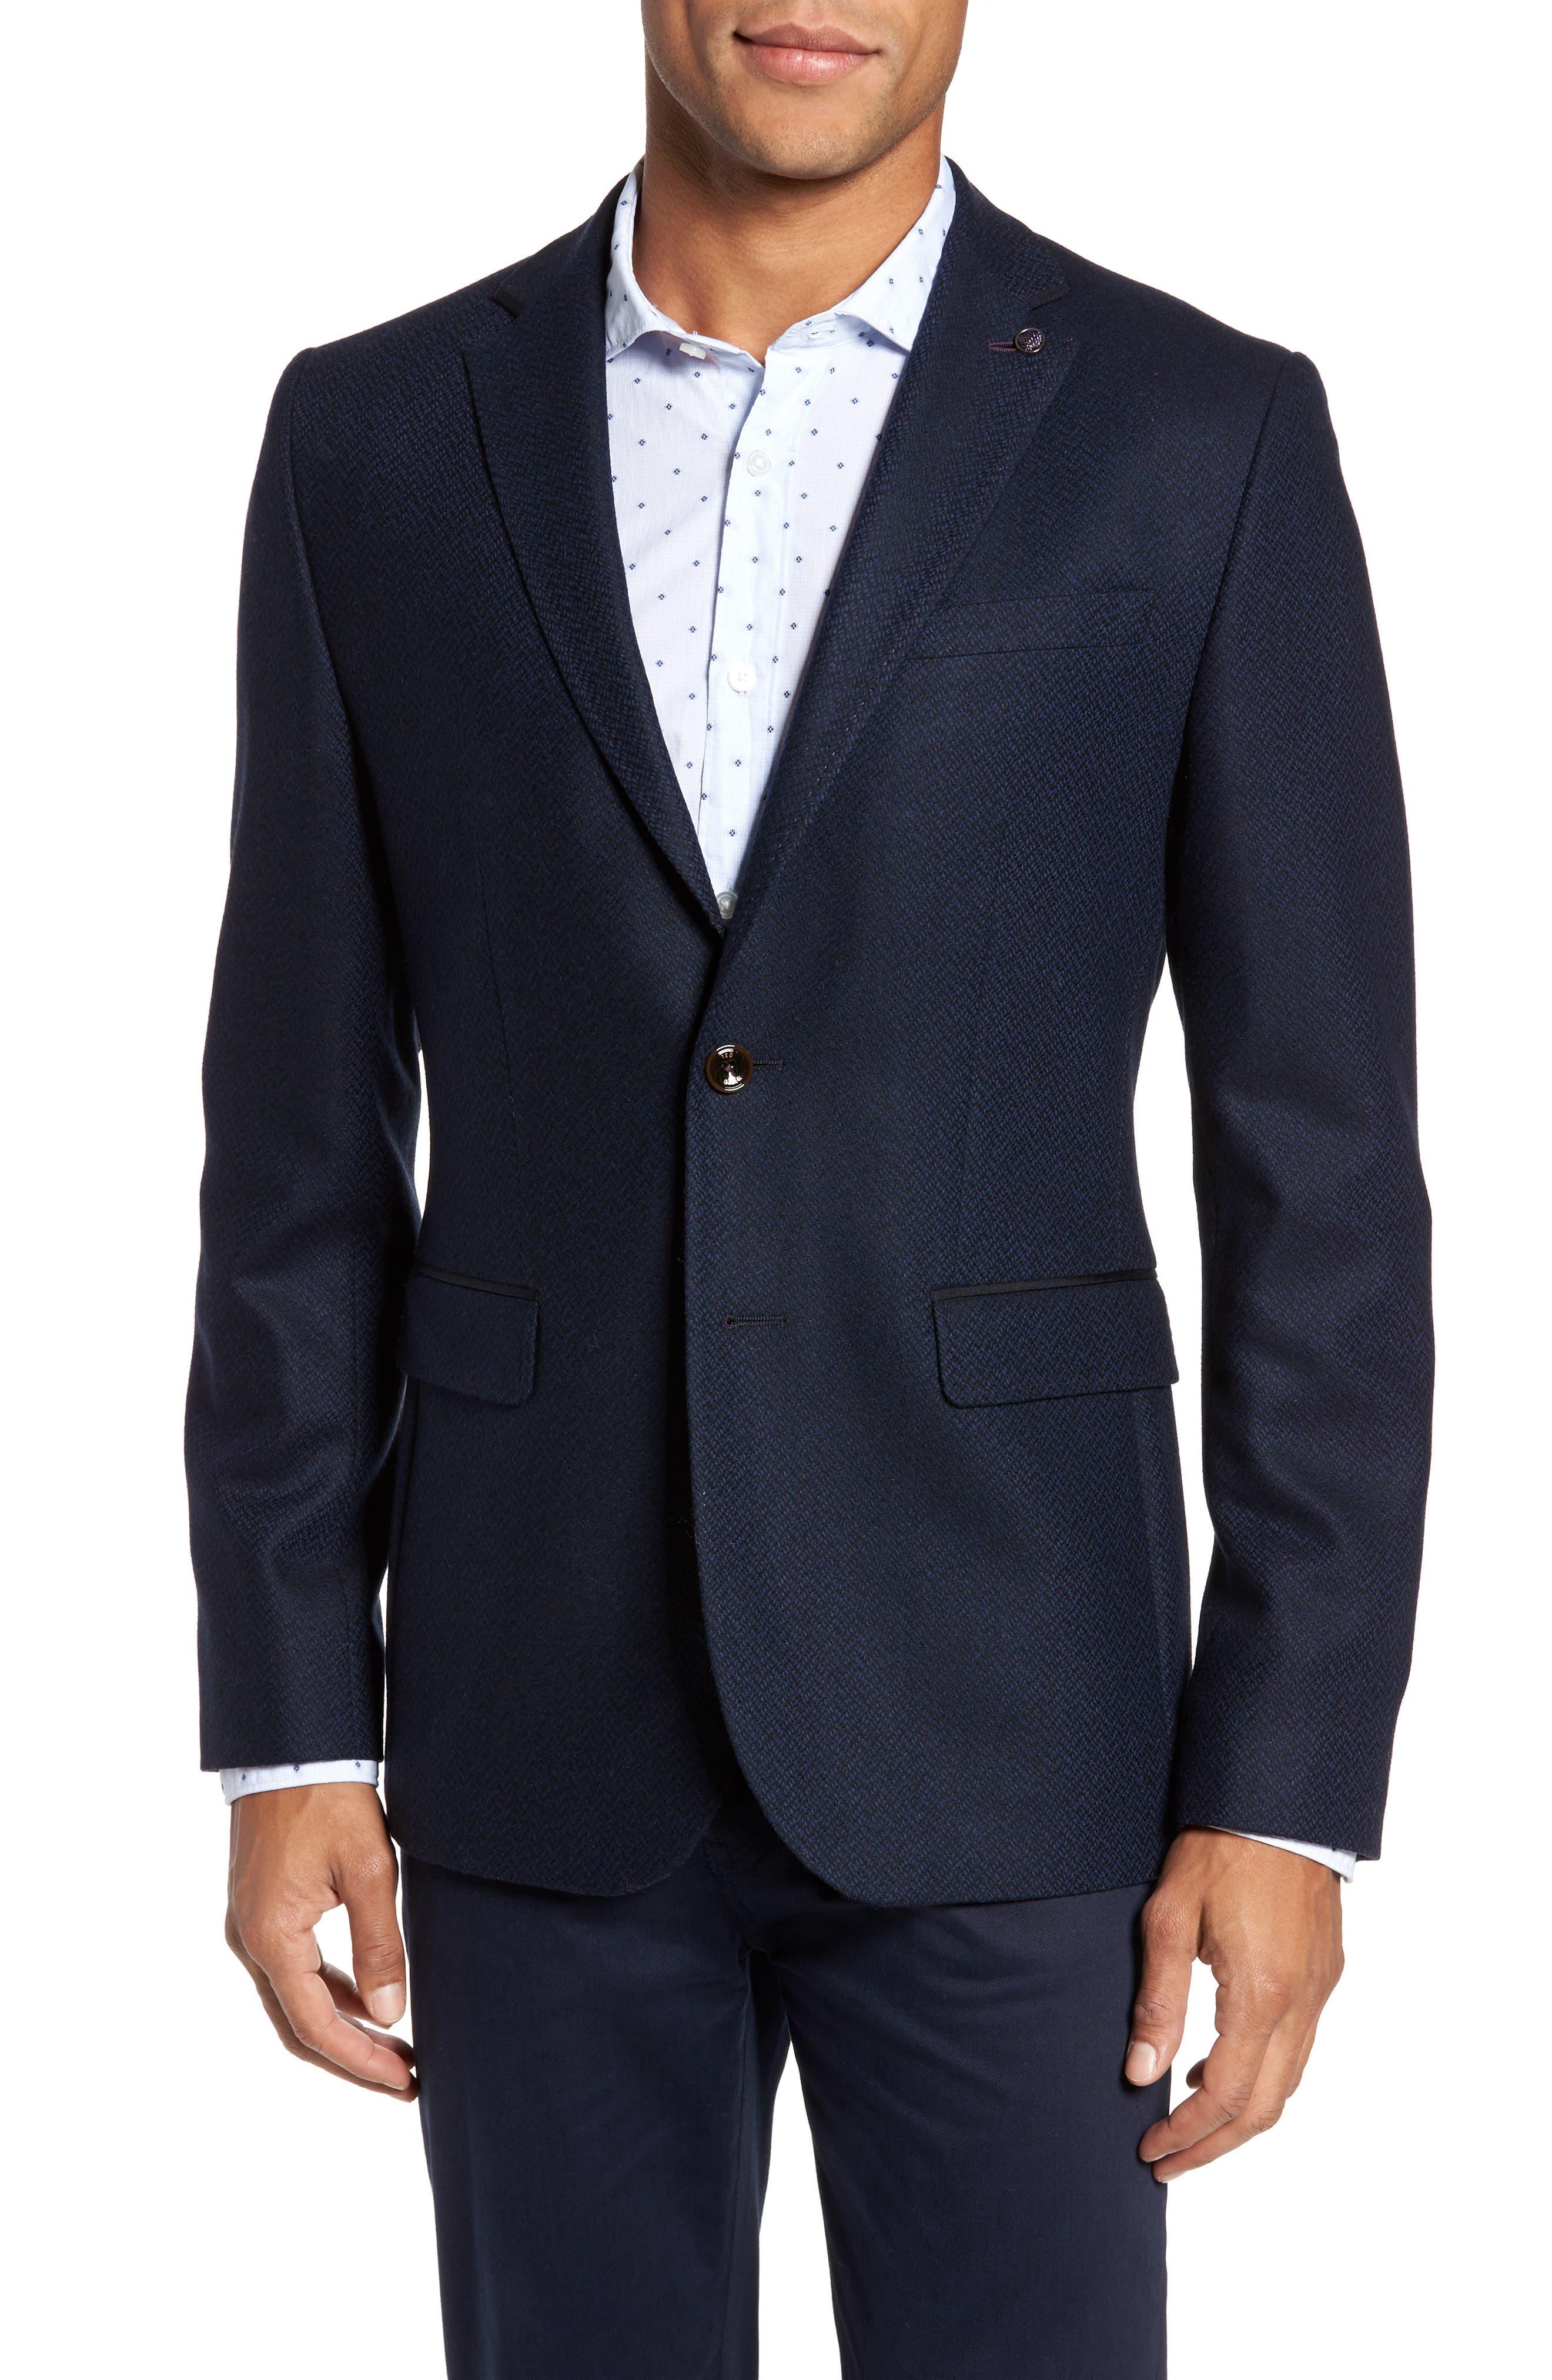 Black button jacket mens